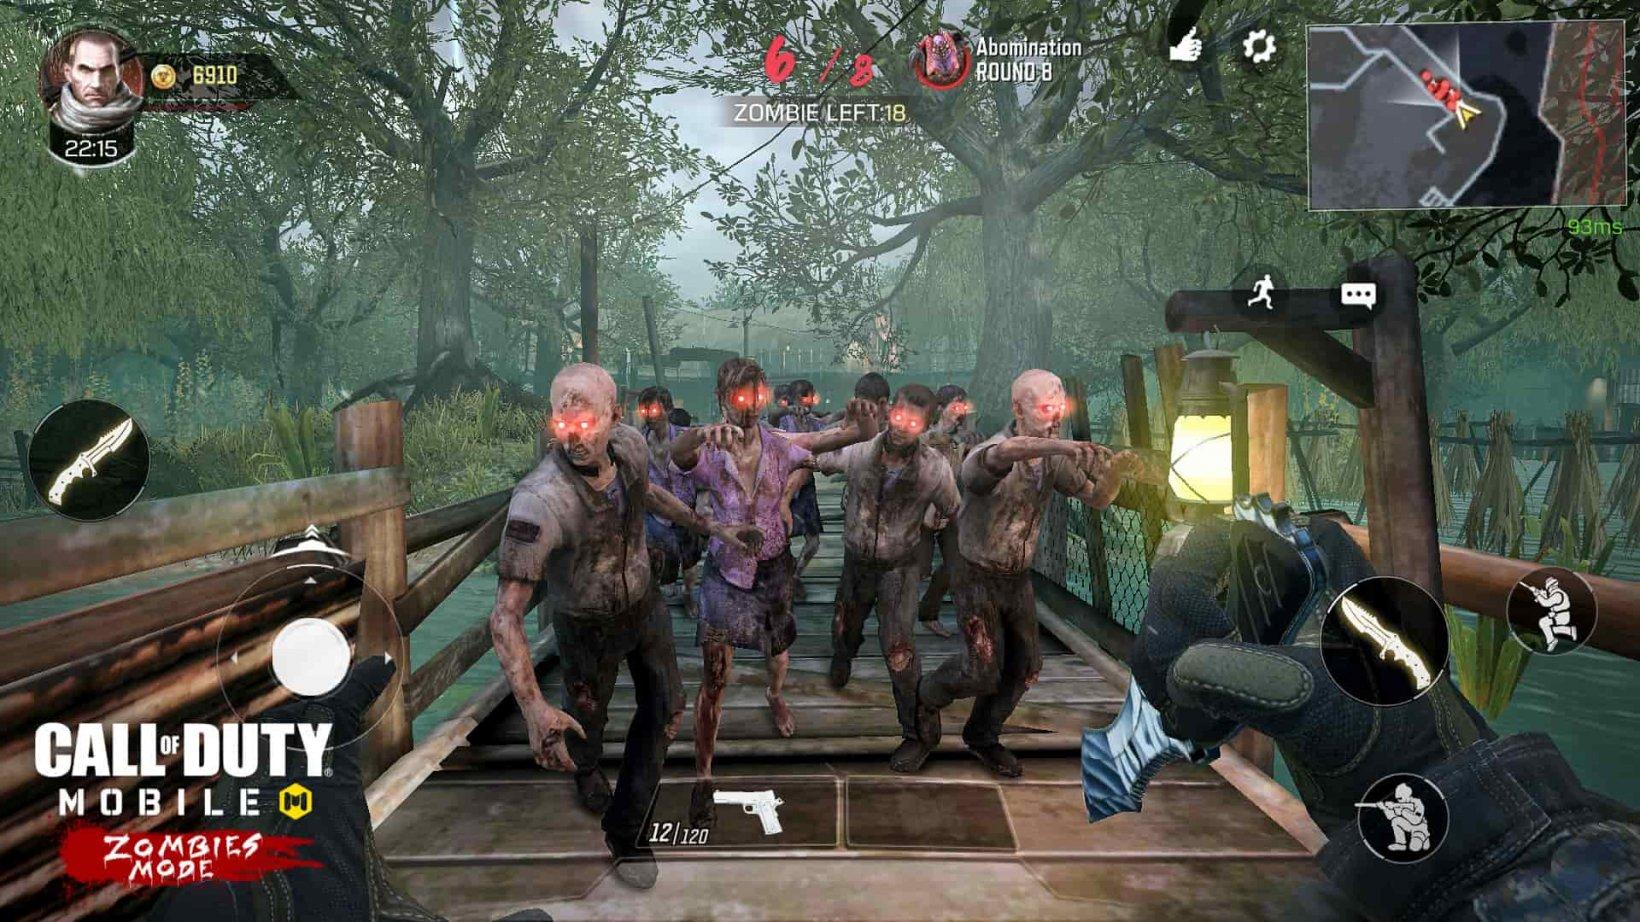 CoD Mobile Zombie mode